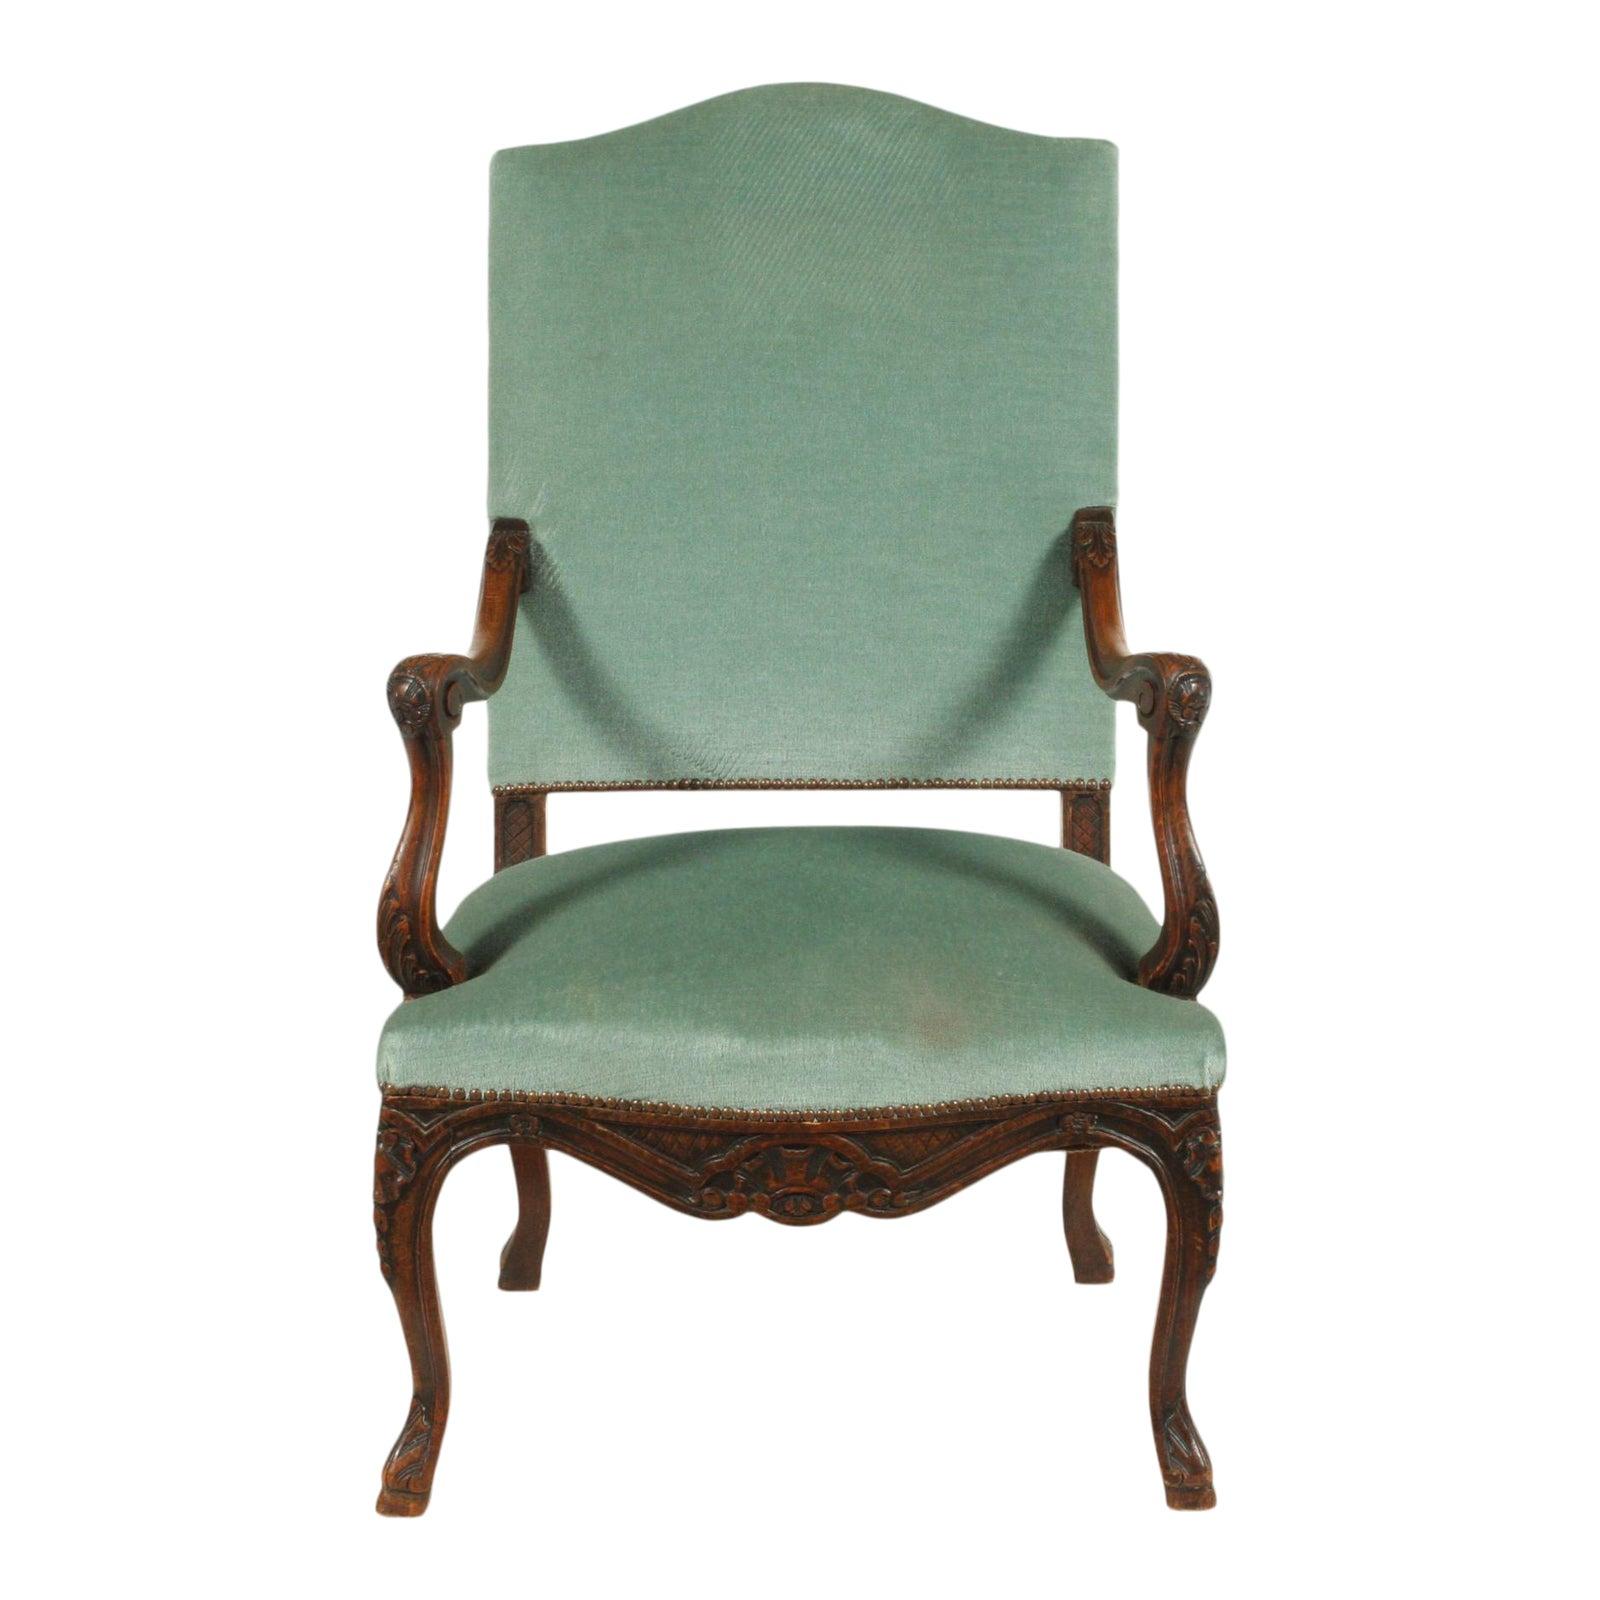 19th-C. French Louis XVIII-Style Armchair   Chairish